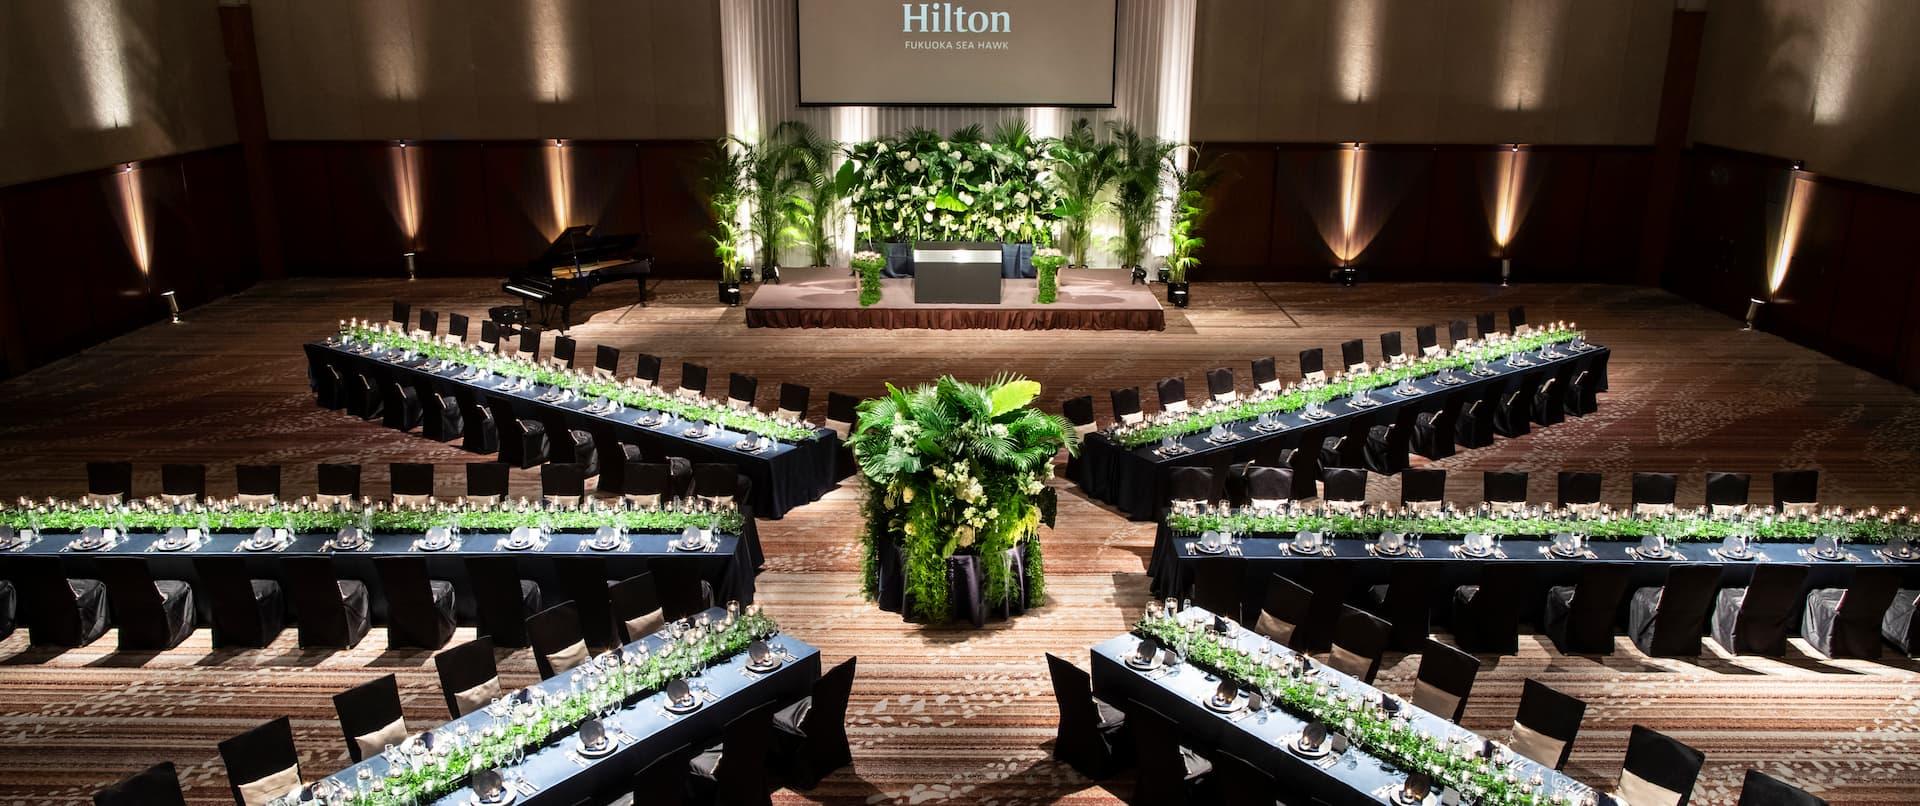 Hilton Fukuoka Sea Hawk Meeting Event